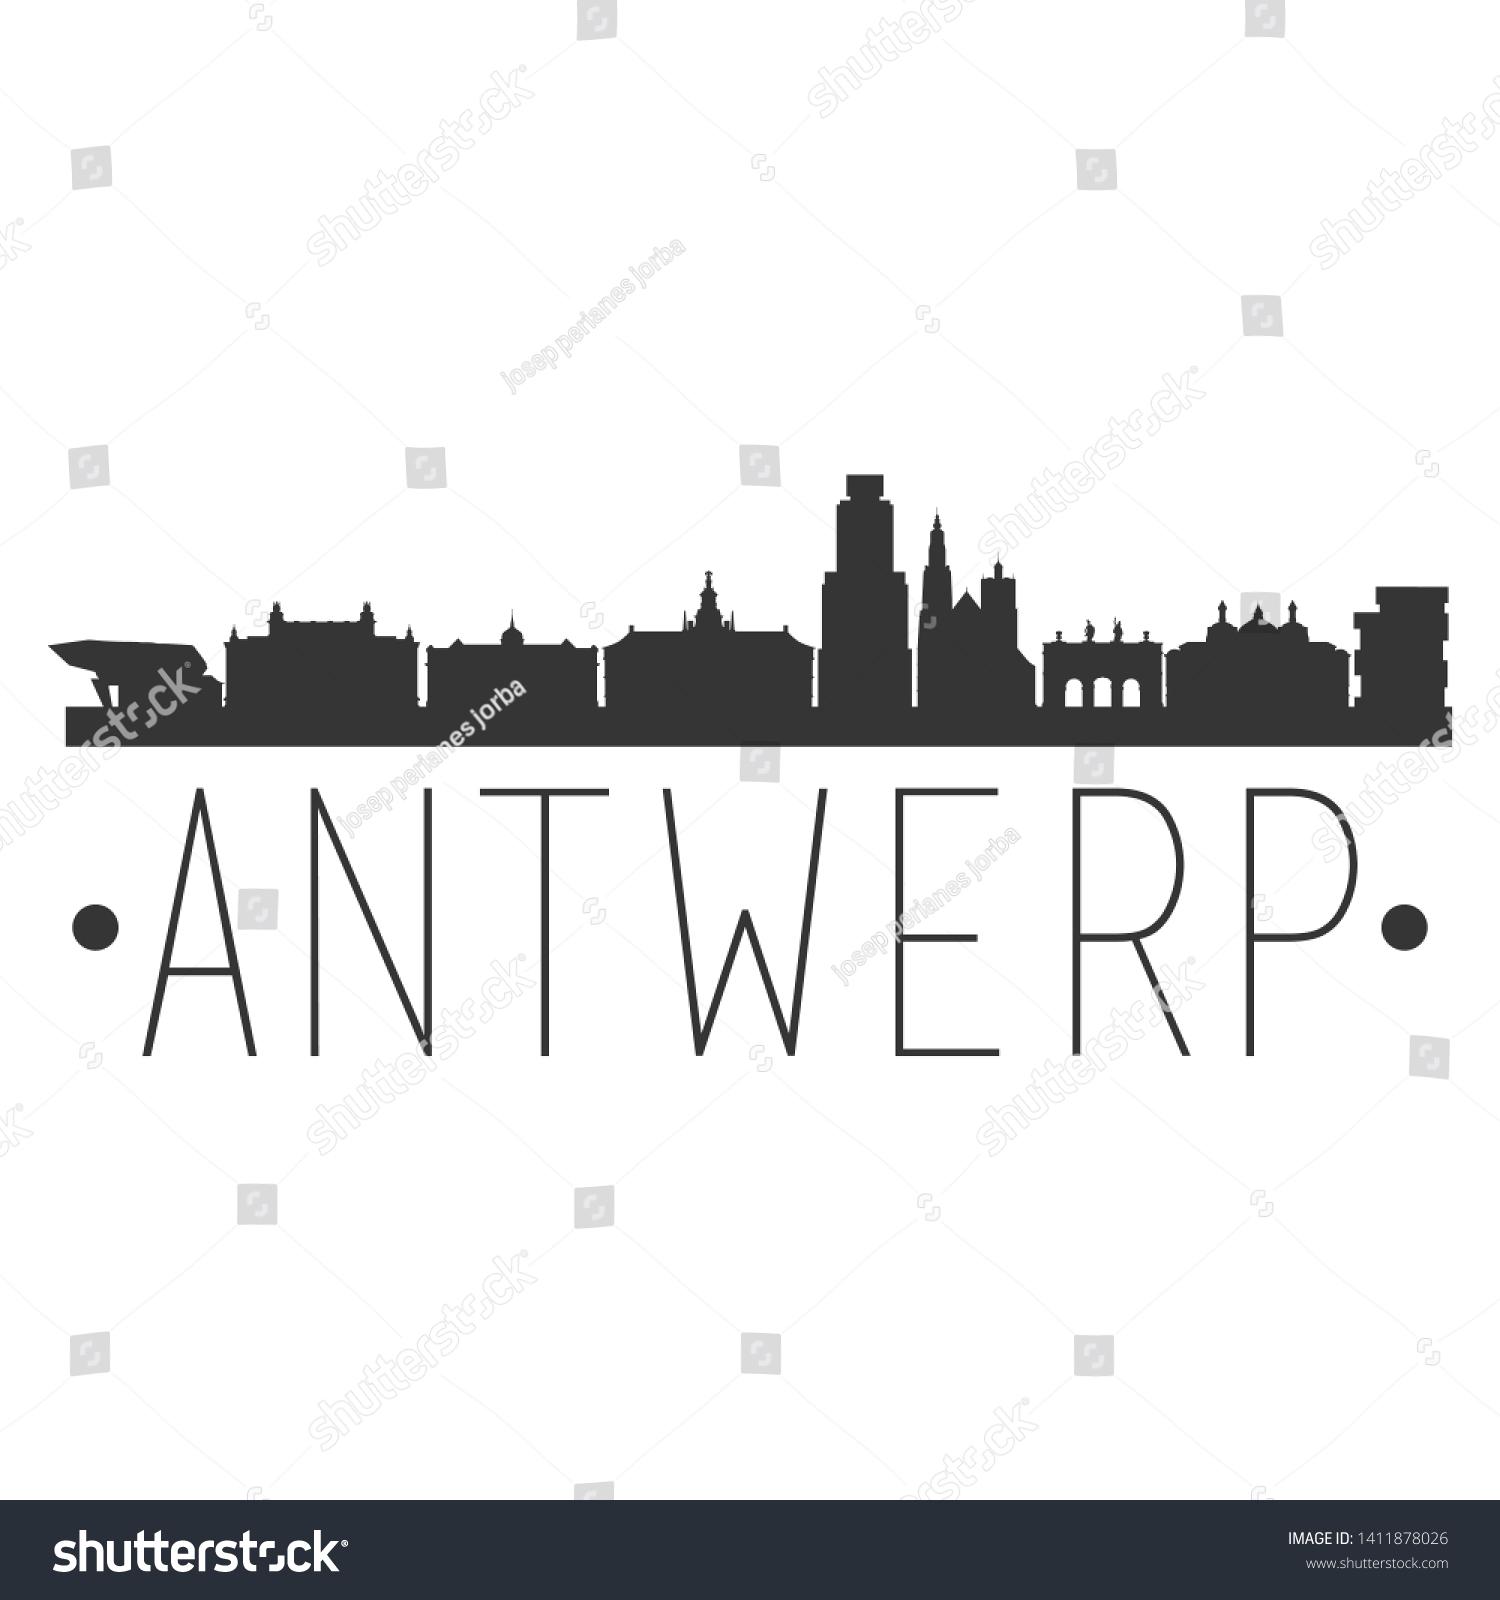 Antwerp Belgium City Skyline Silhouette City Stock Vector Royalty Free 1411878026